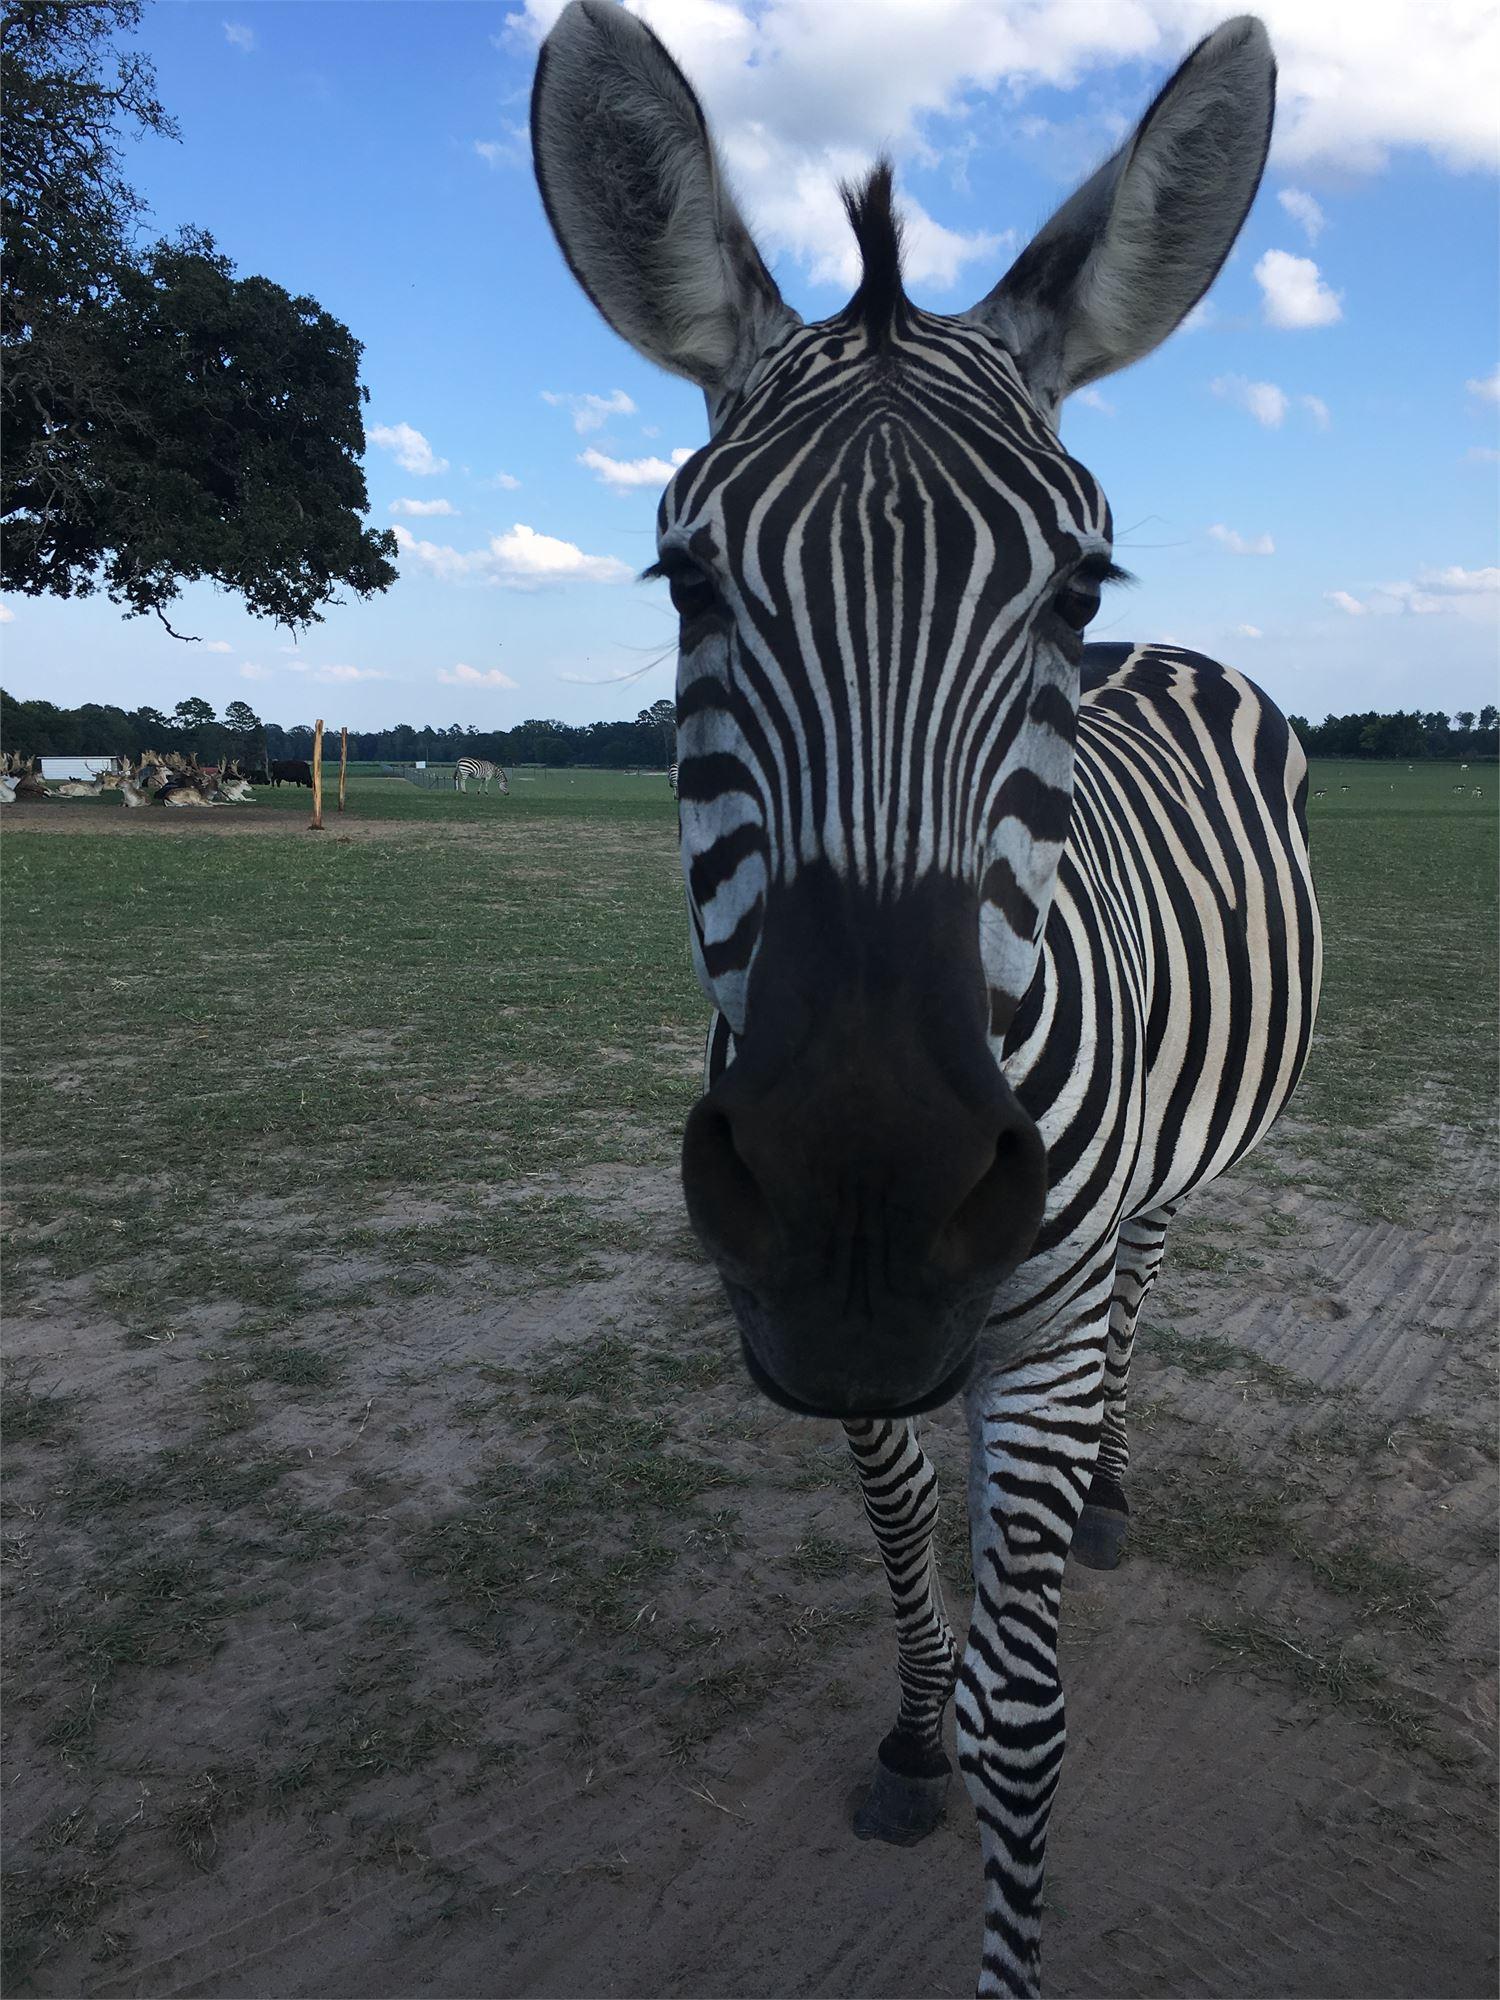 Grapeland Safari